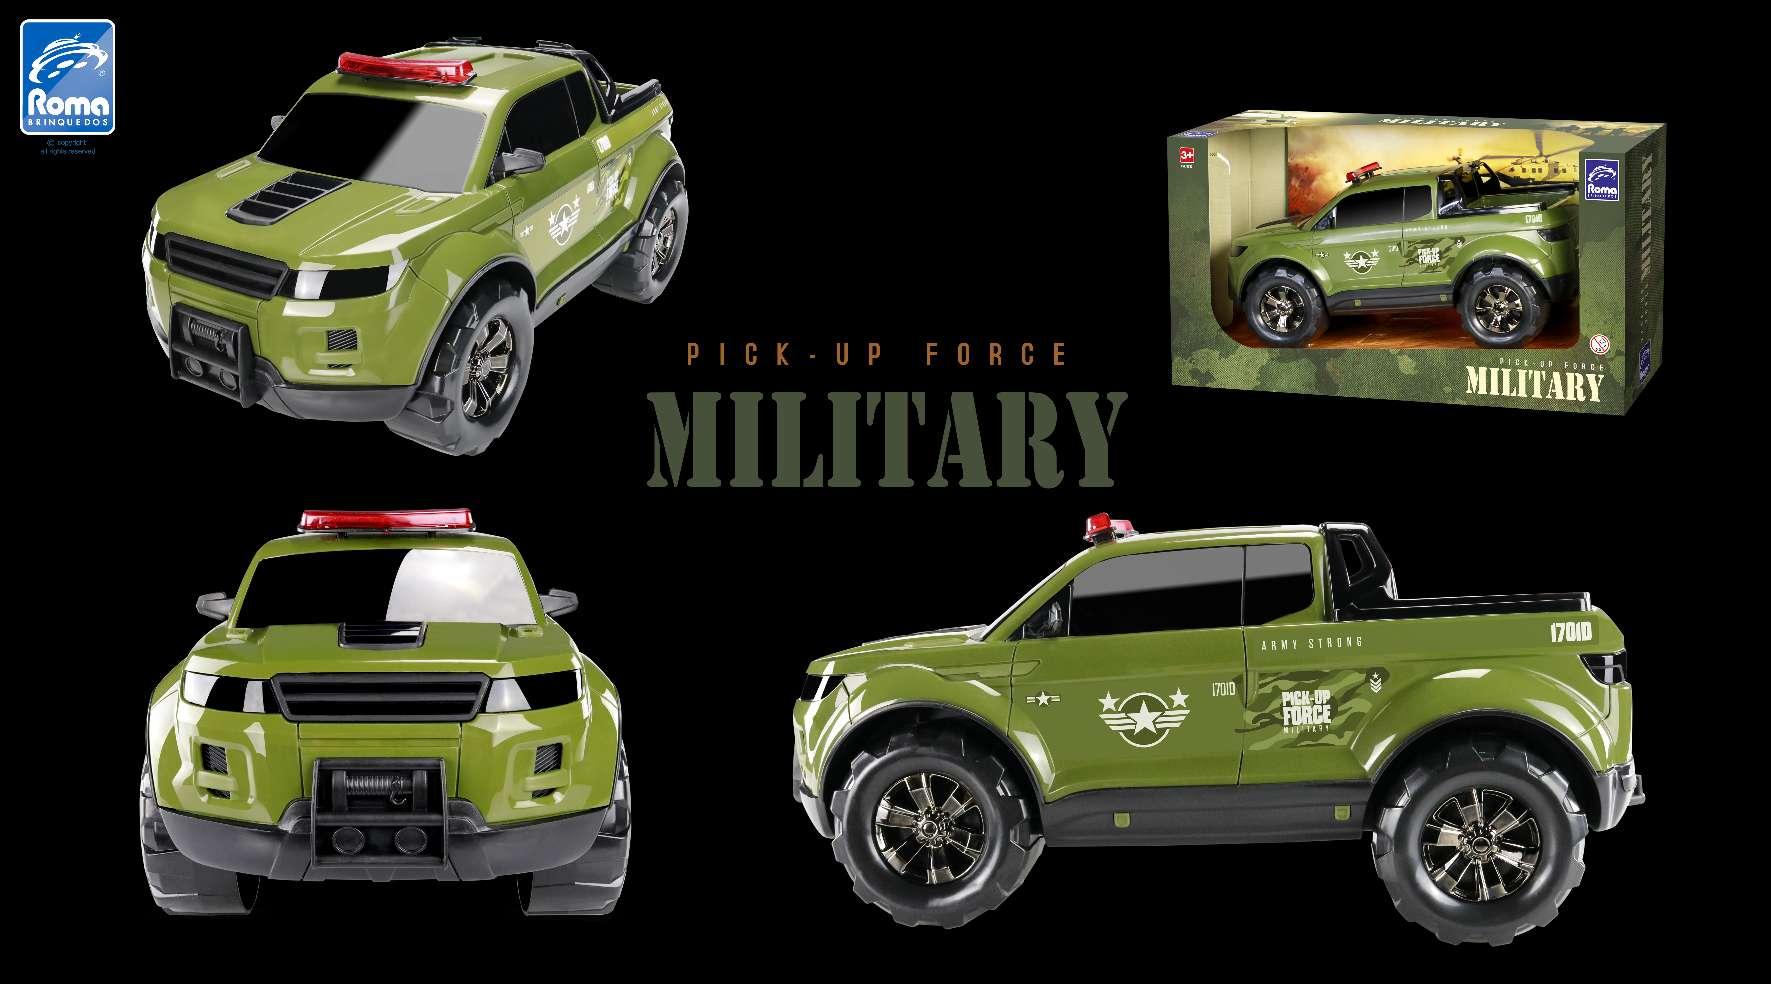 Caminhonete Pick-Up Force Military - Roma 993